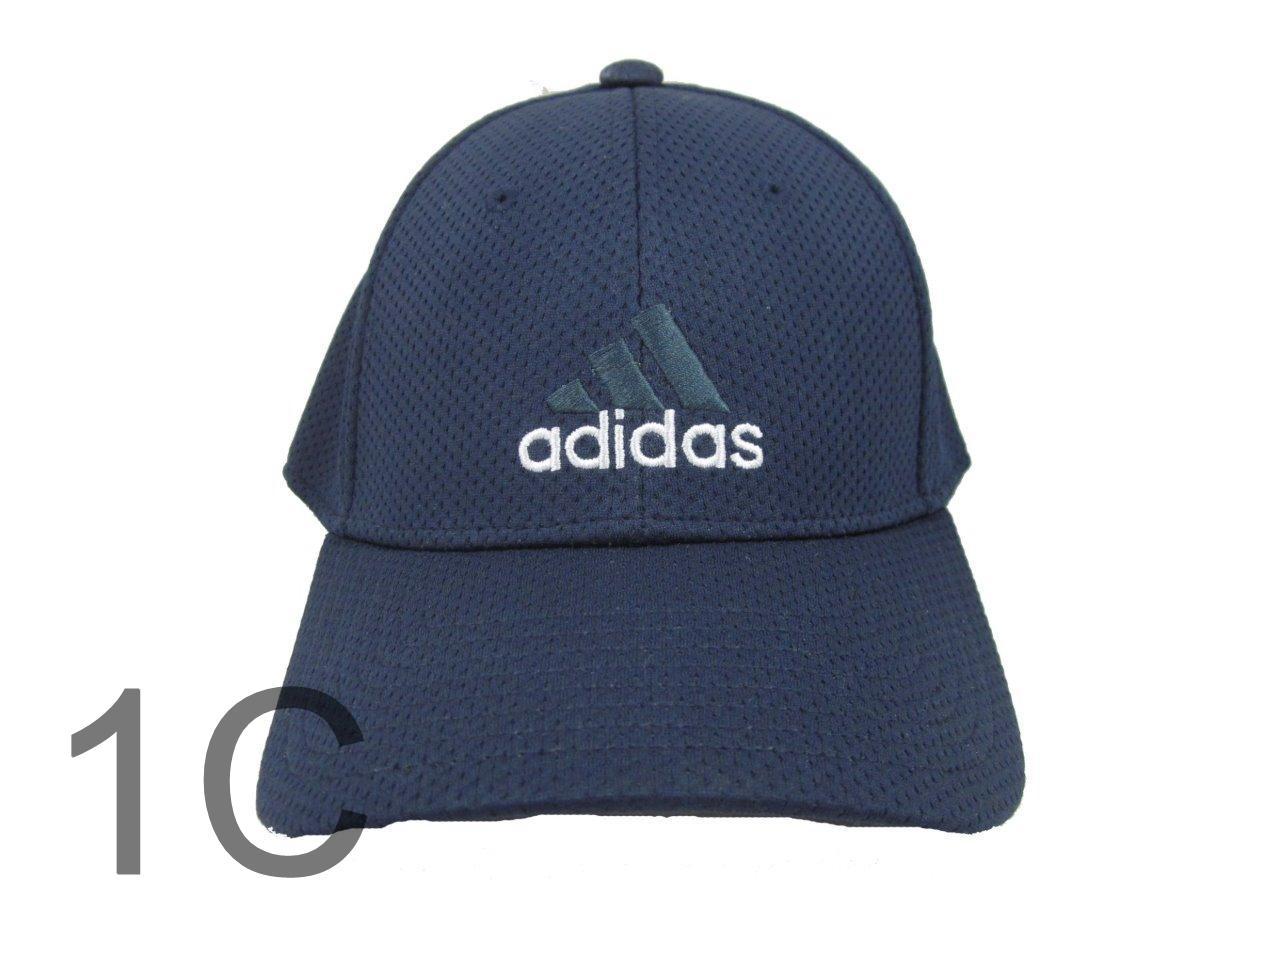 adidas flex fit cap hat baseball basketball running black